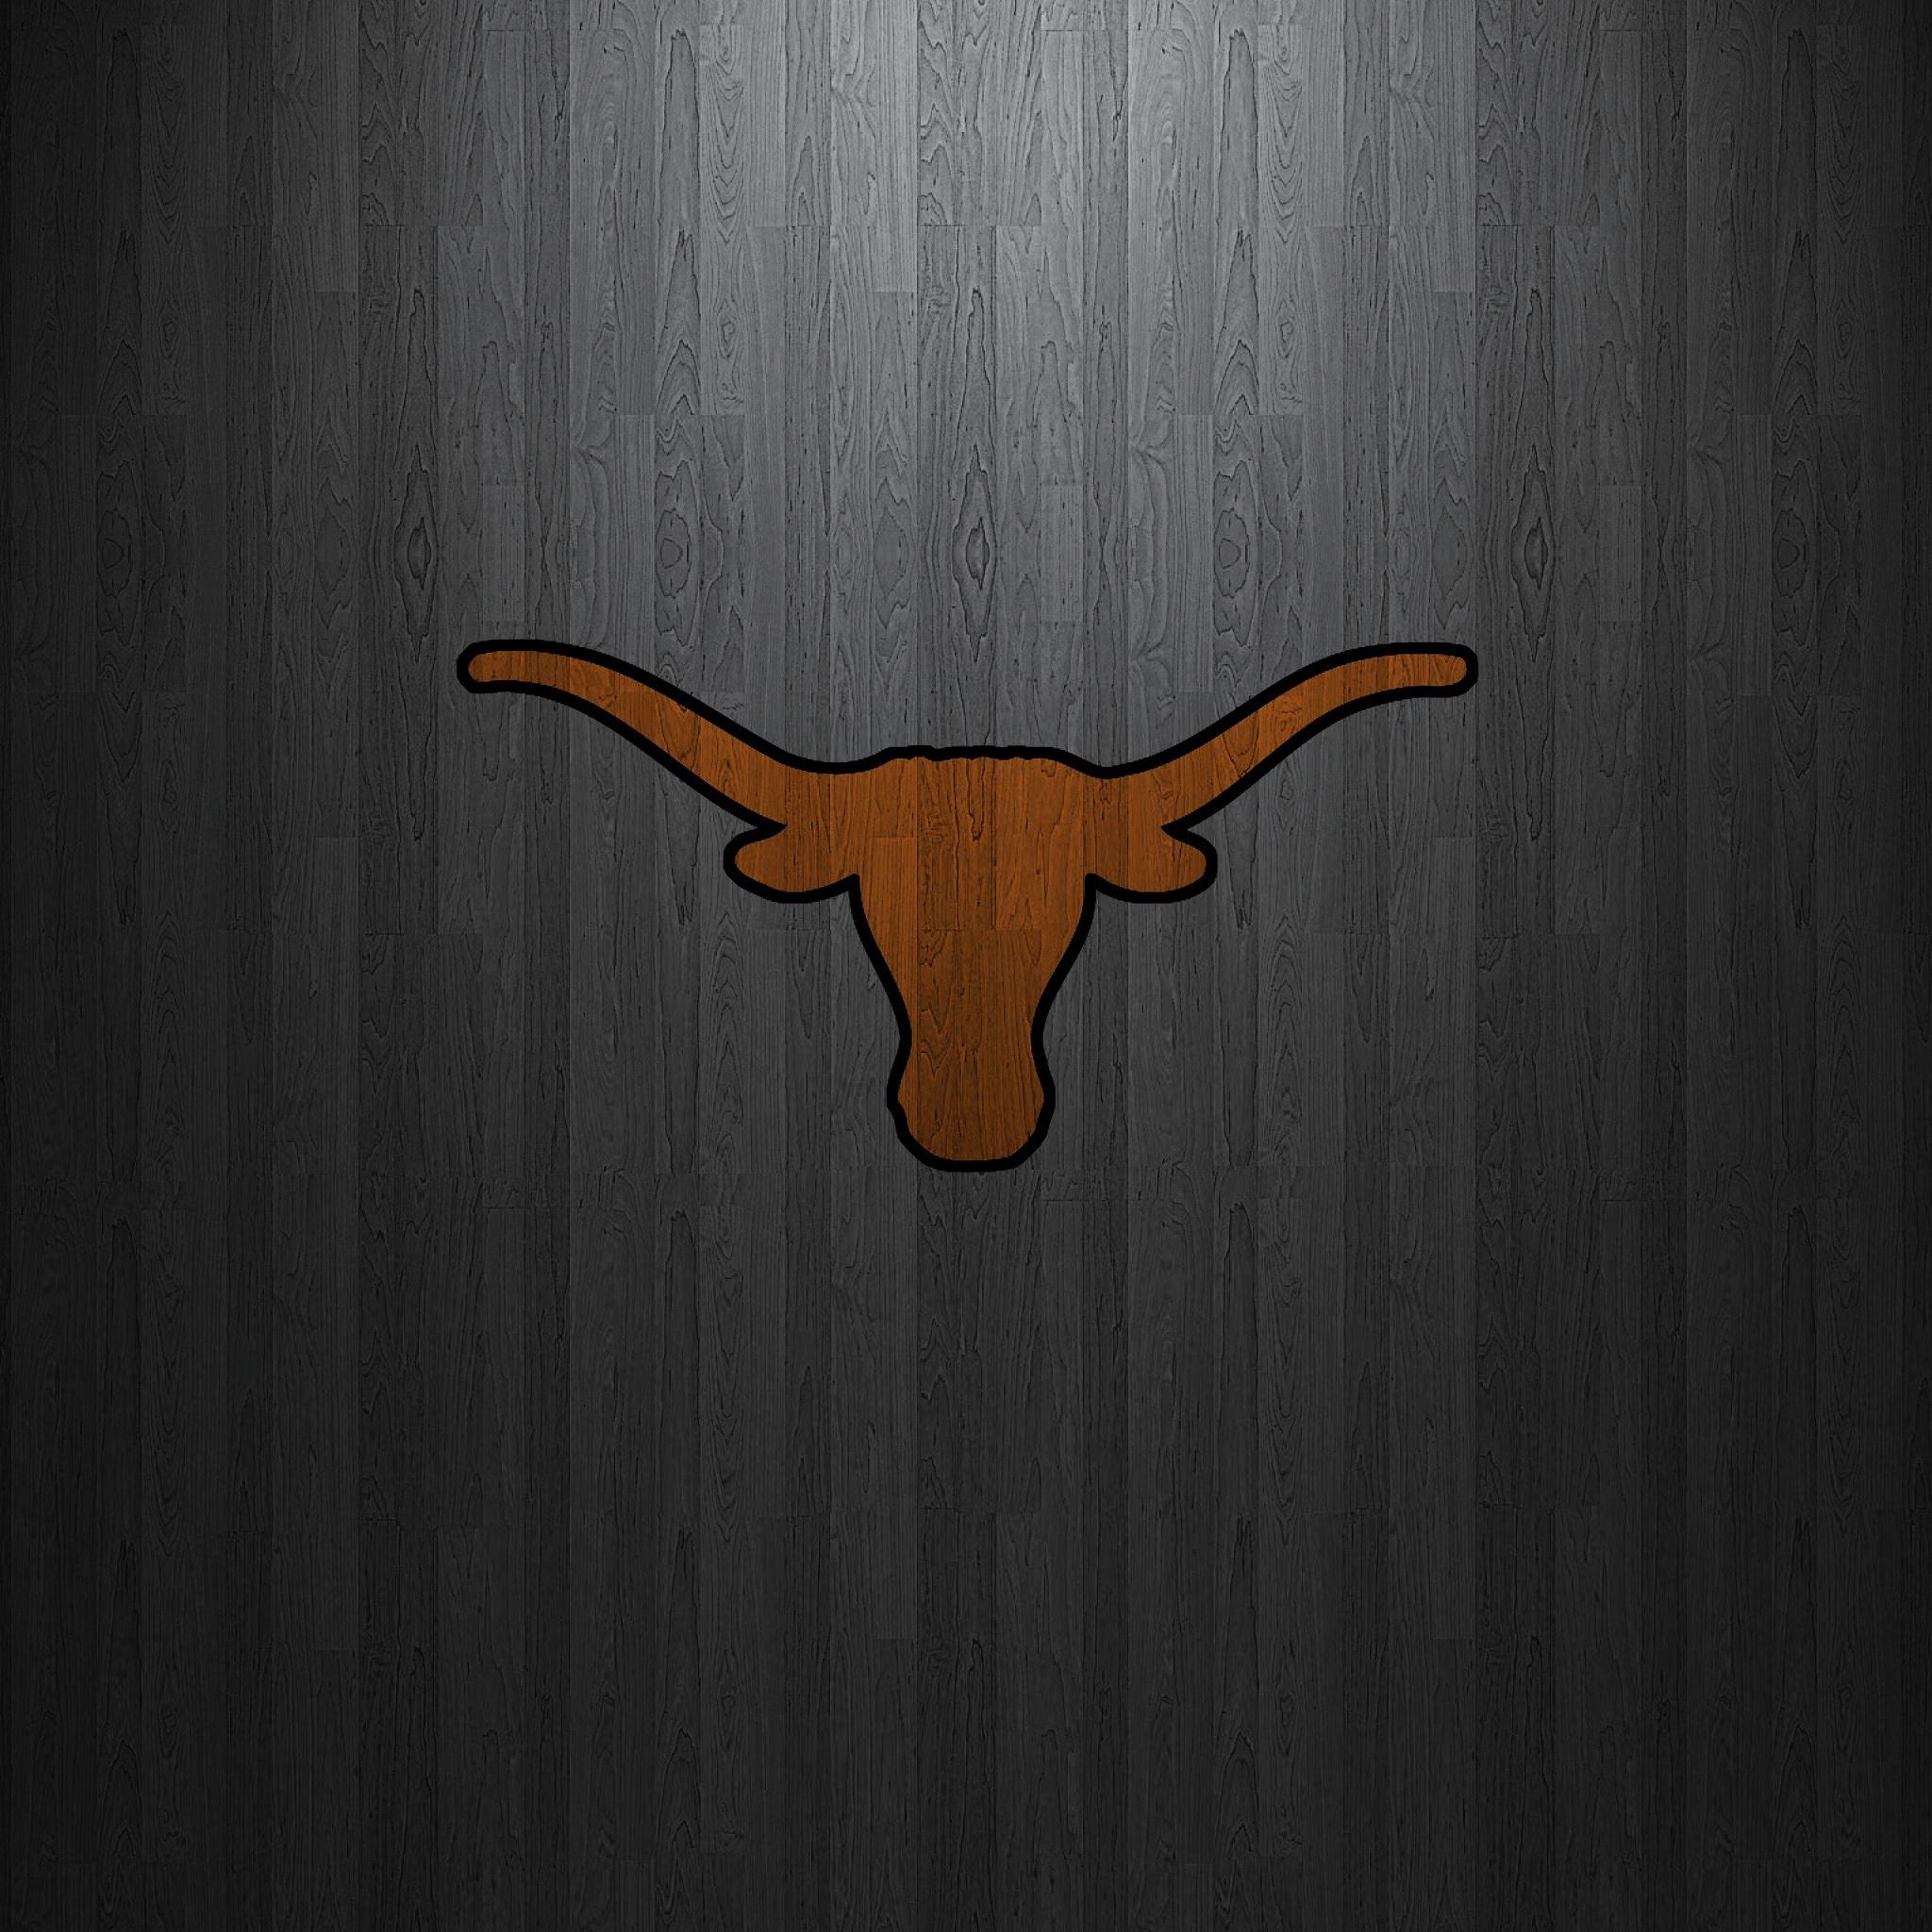 Texas Longhorns Wallpapers Sf Wallpaper